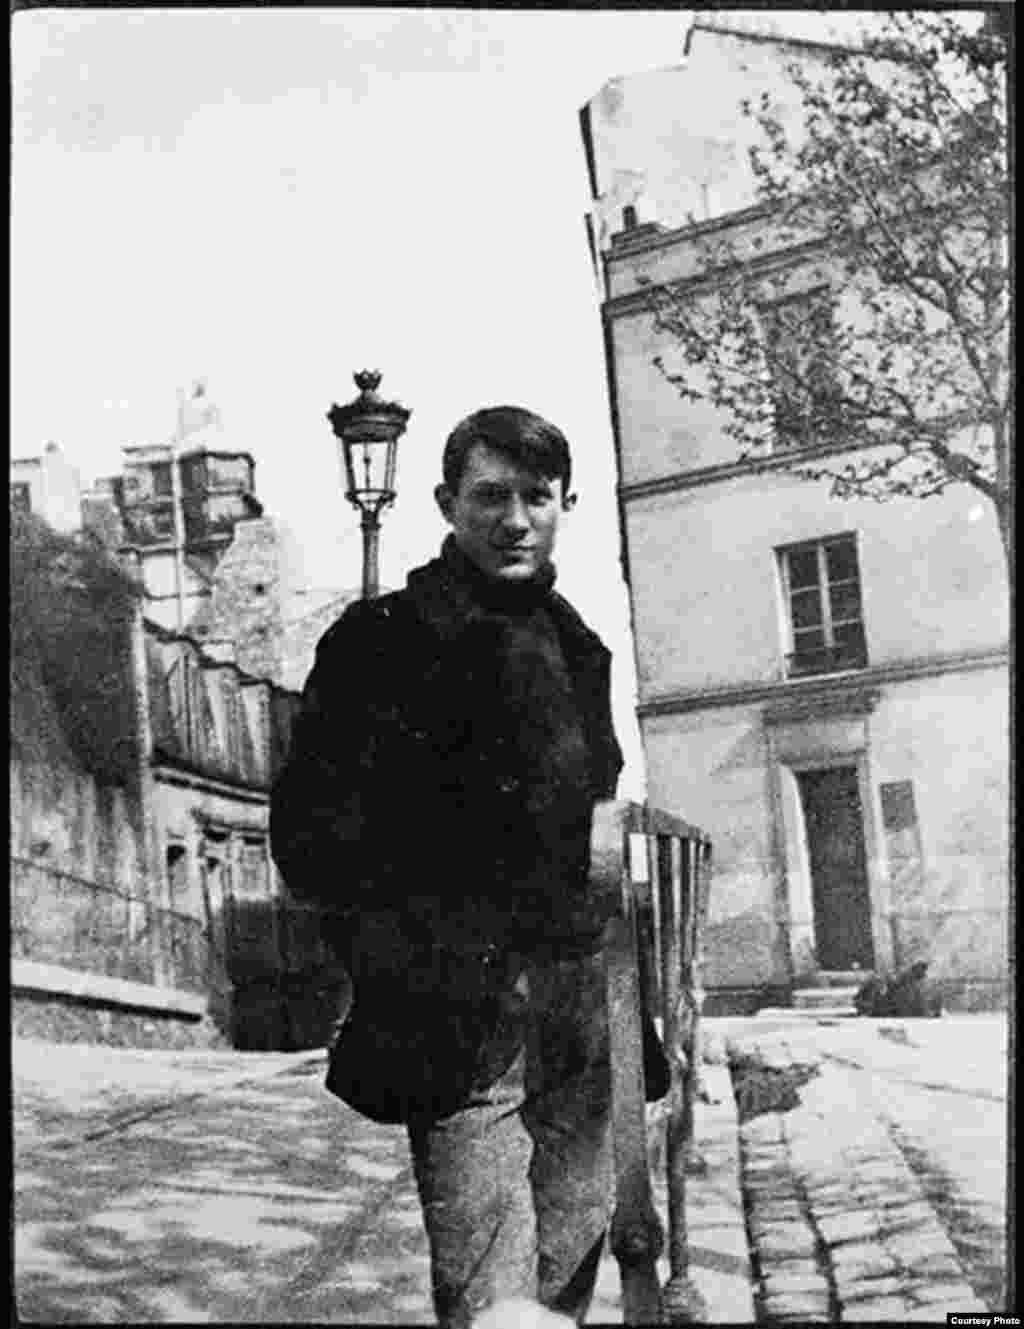 Picasso în 1904 în Place Ravignan, Paris (Foto: Fondation Beyeler Press Service).